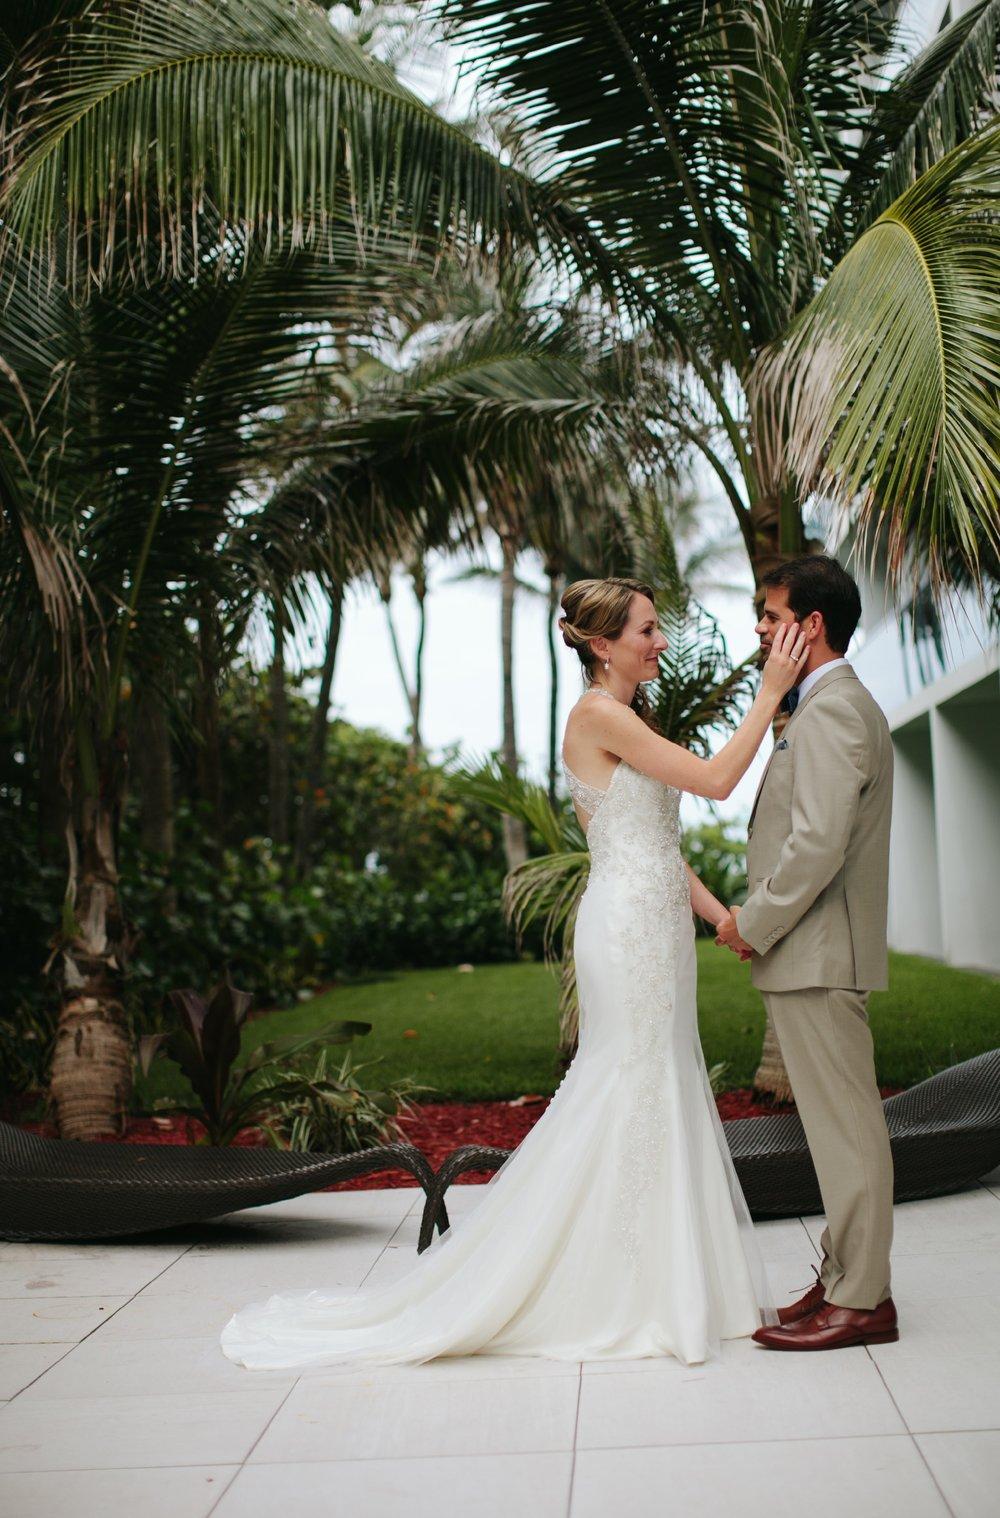 Wedding at the Tideline Resort in Palm Beach25.jpg